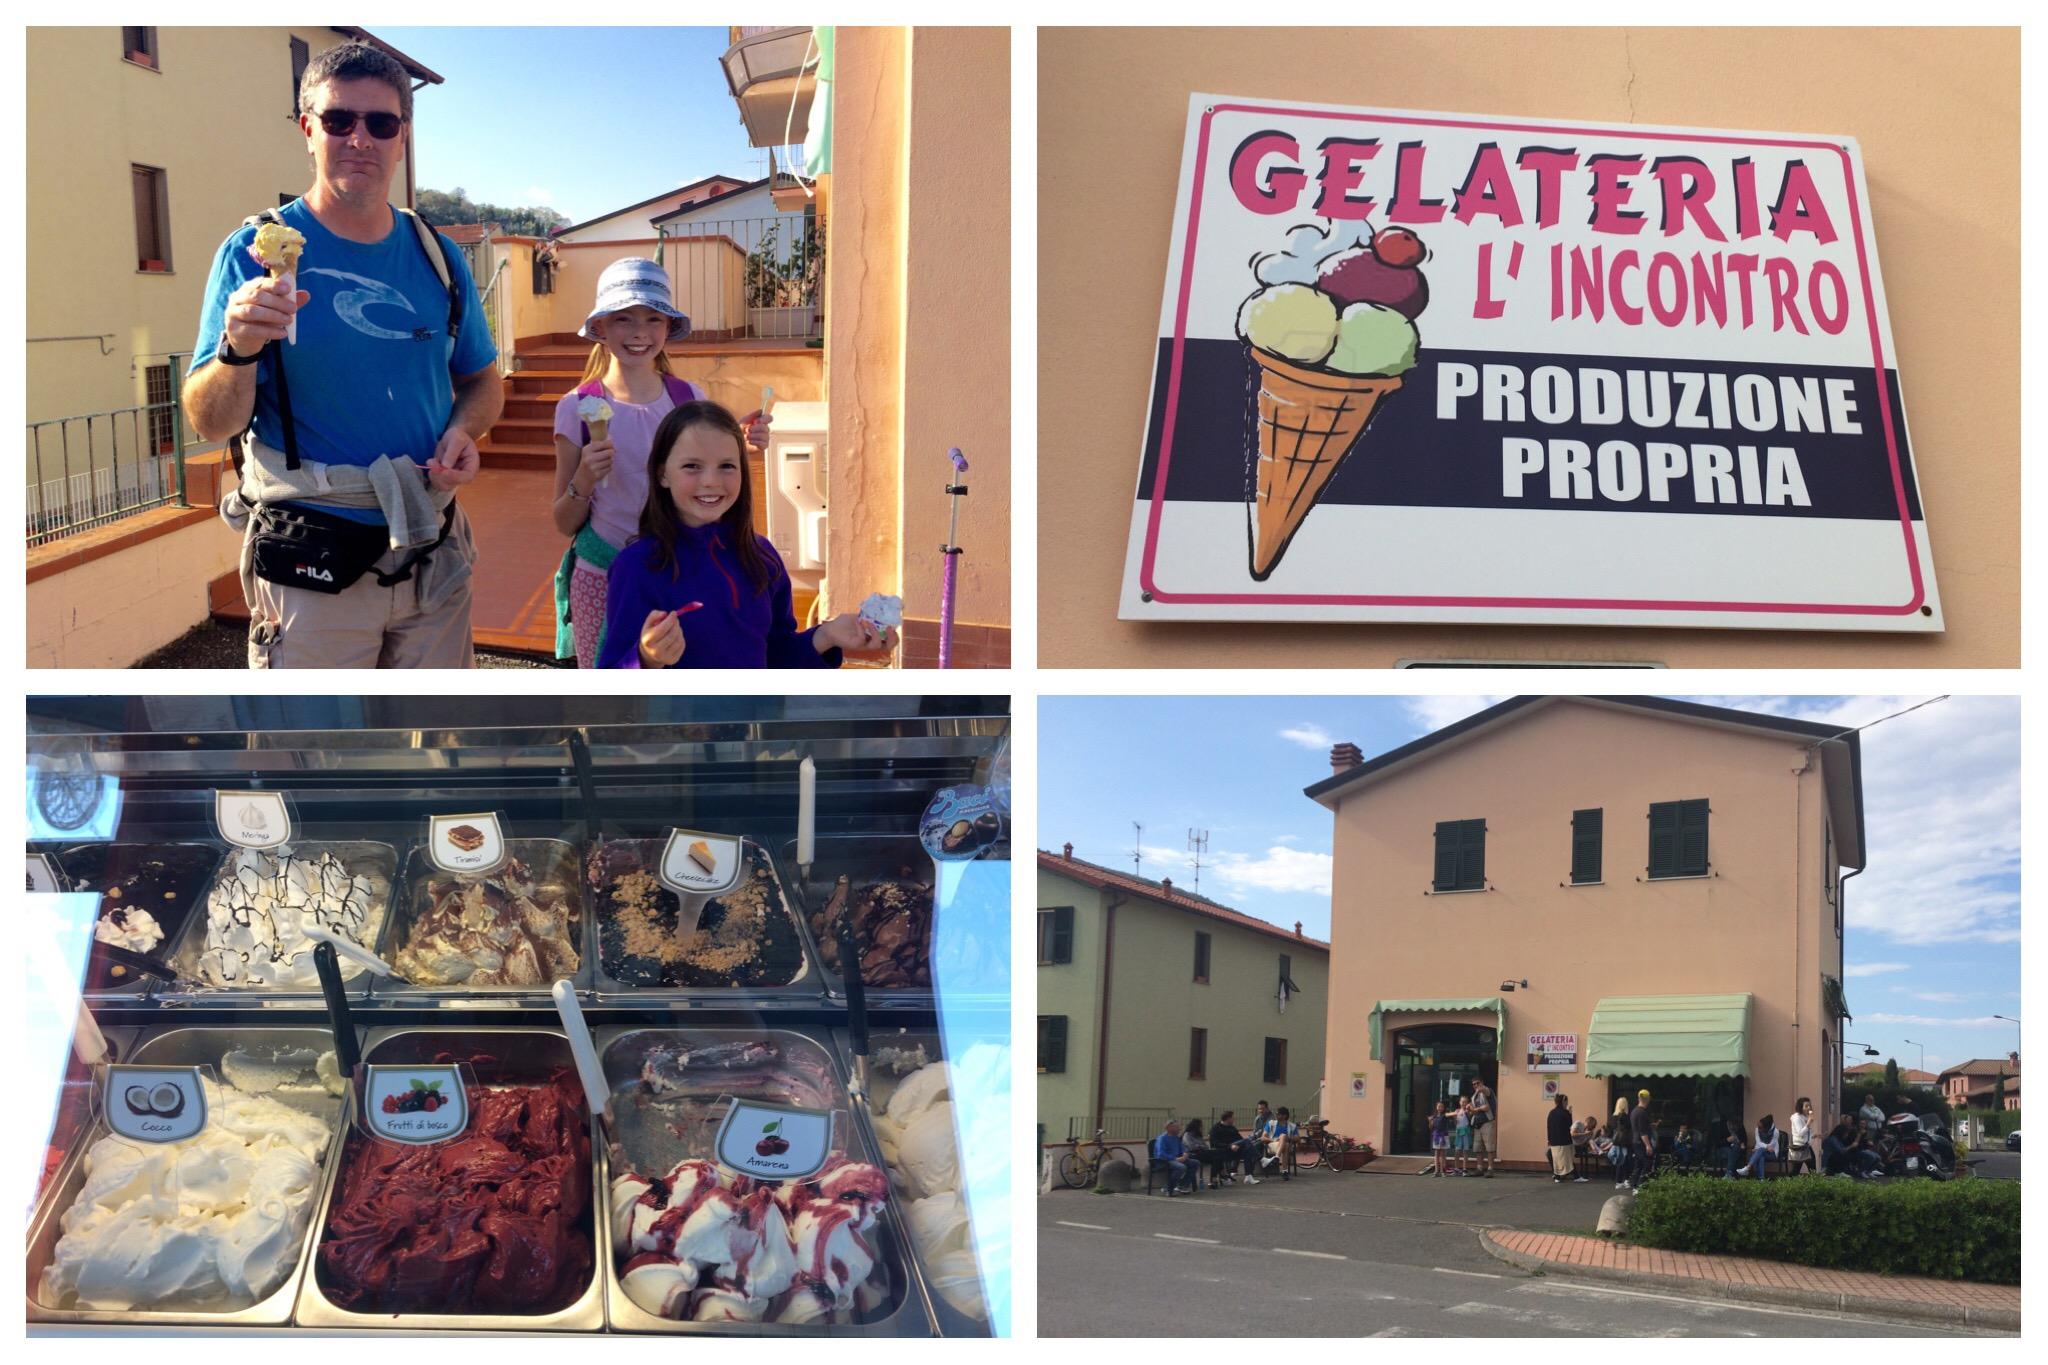 Liguria - Ameglia Gelateria L'Incontro